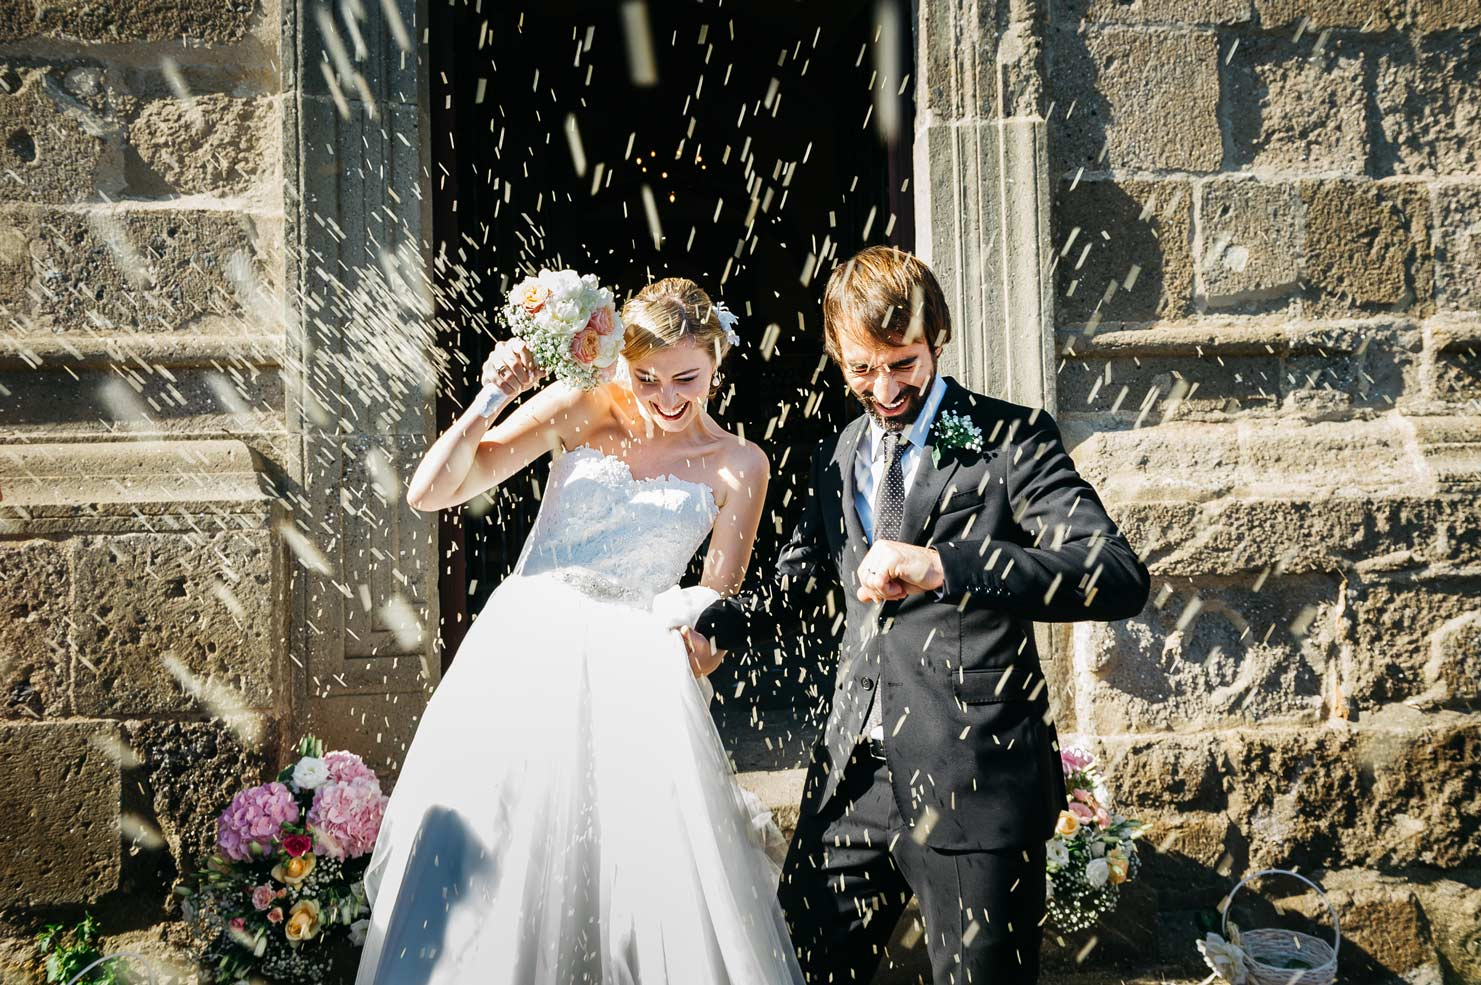 Fotografo-Sposi-Cerimonia